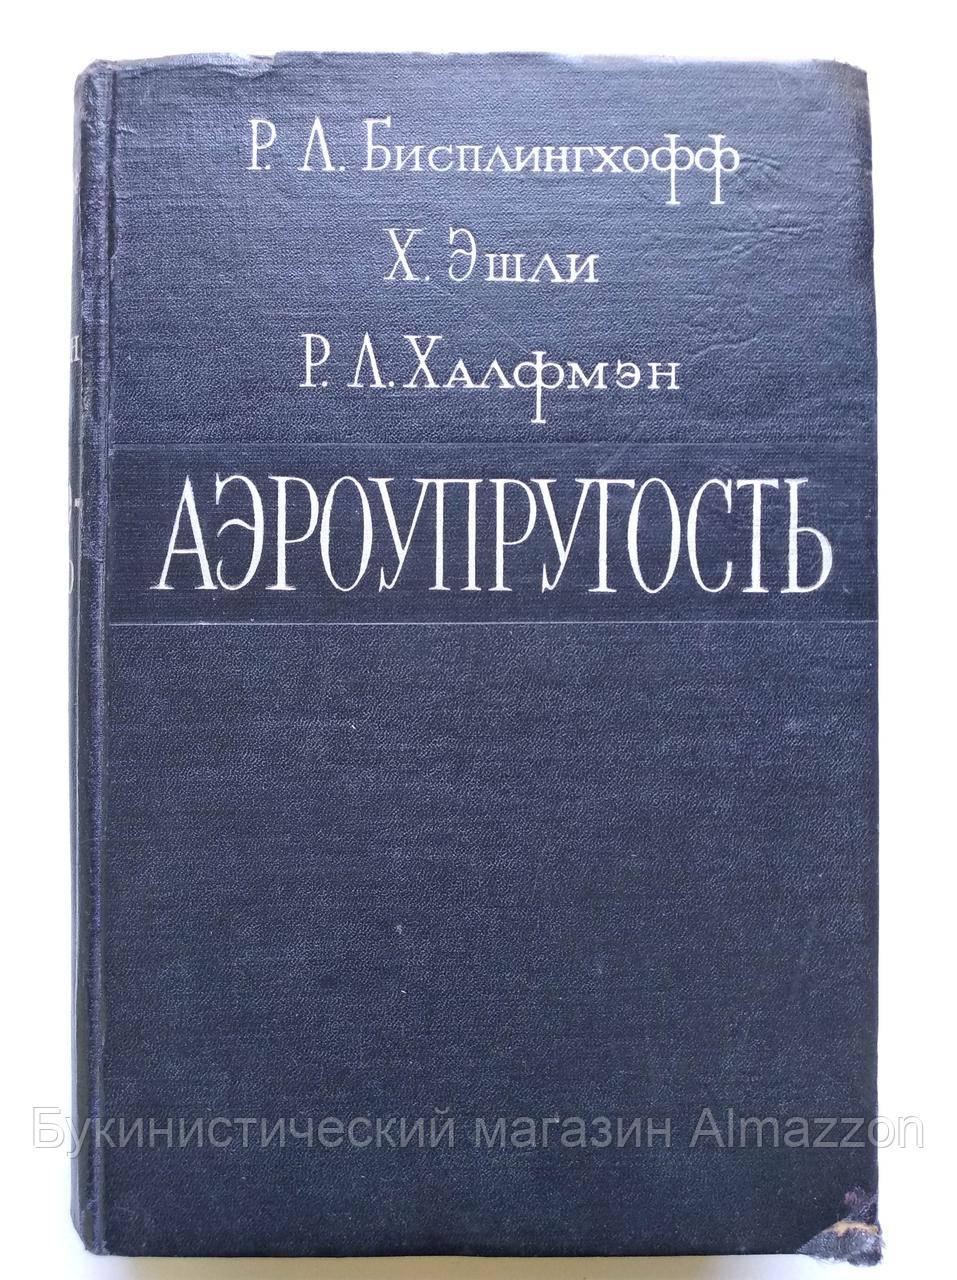 Р.Бисплингхофф Аэроупругость. 1958 год